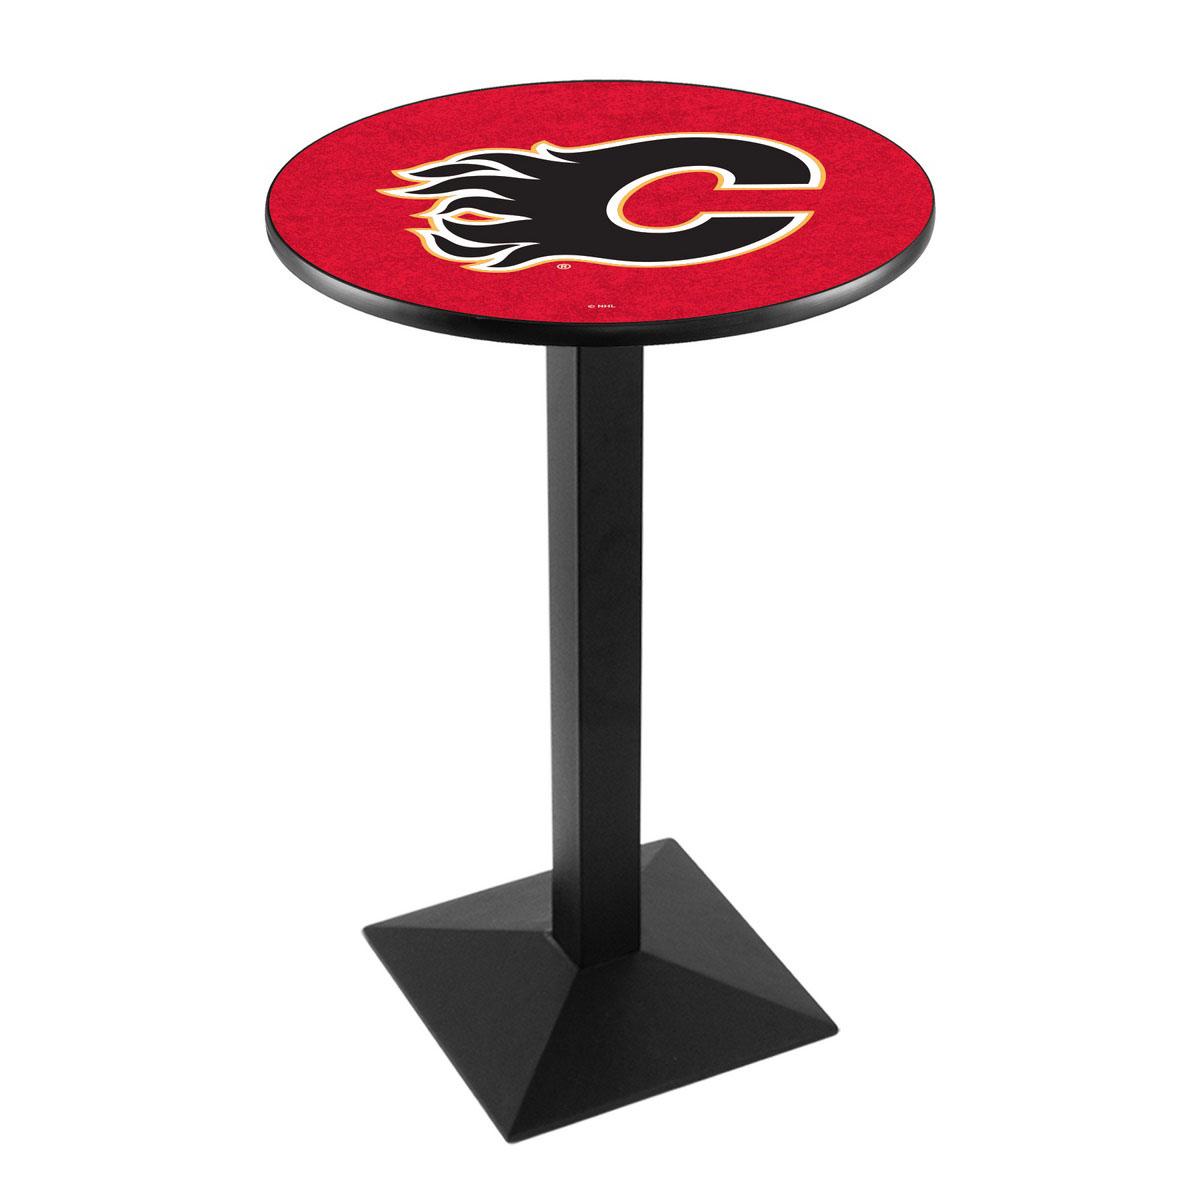 Wonderful Calgary Flames Logo Pub Bar Table Square Stand Product Photo